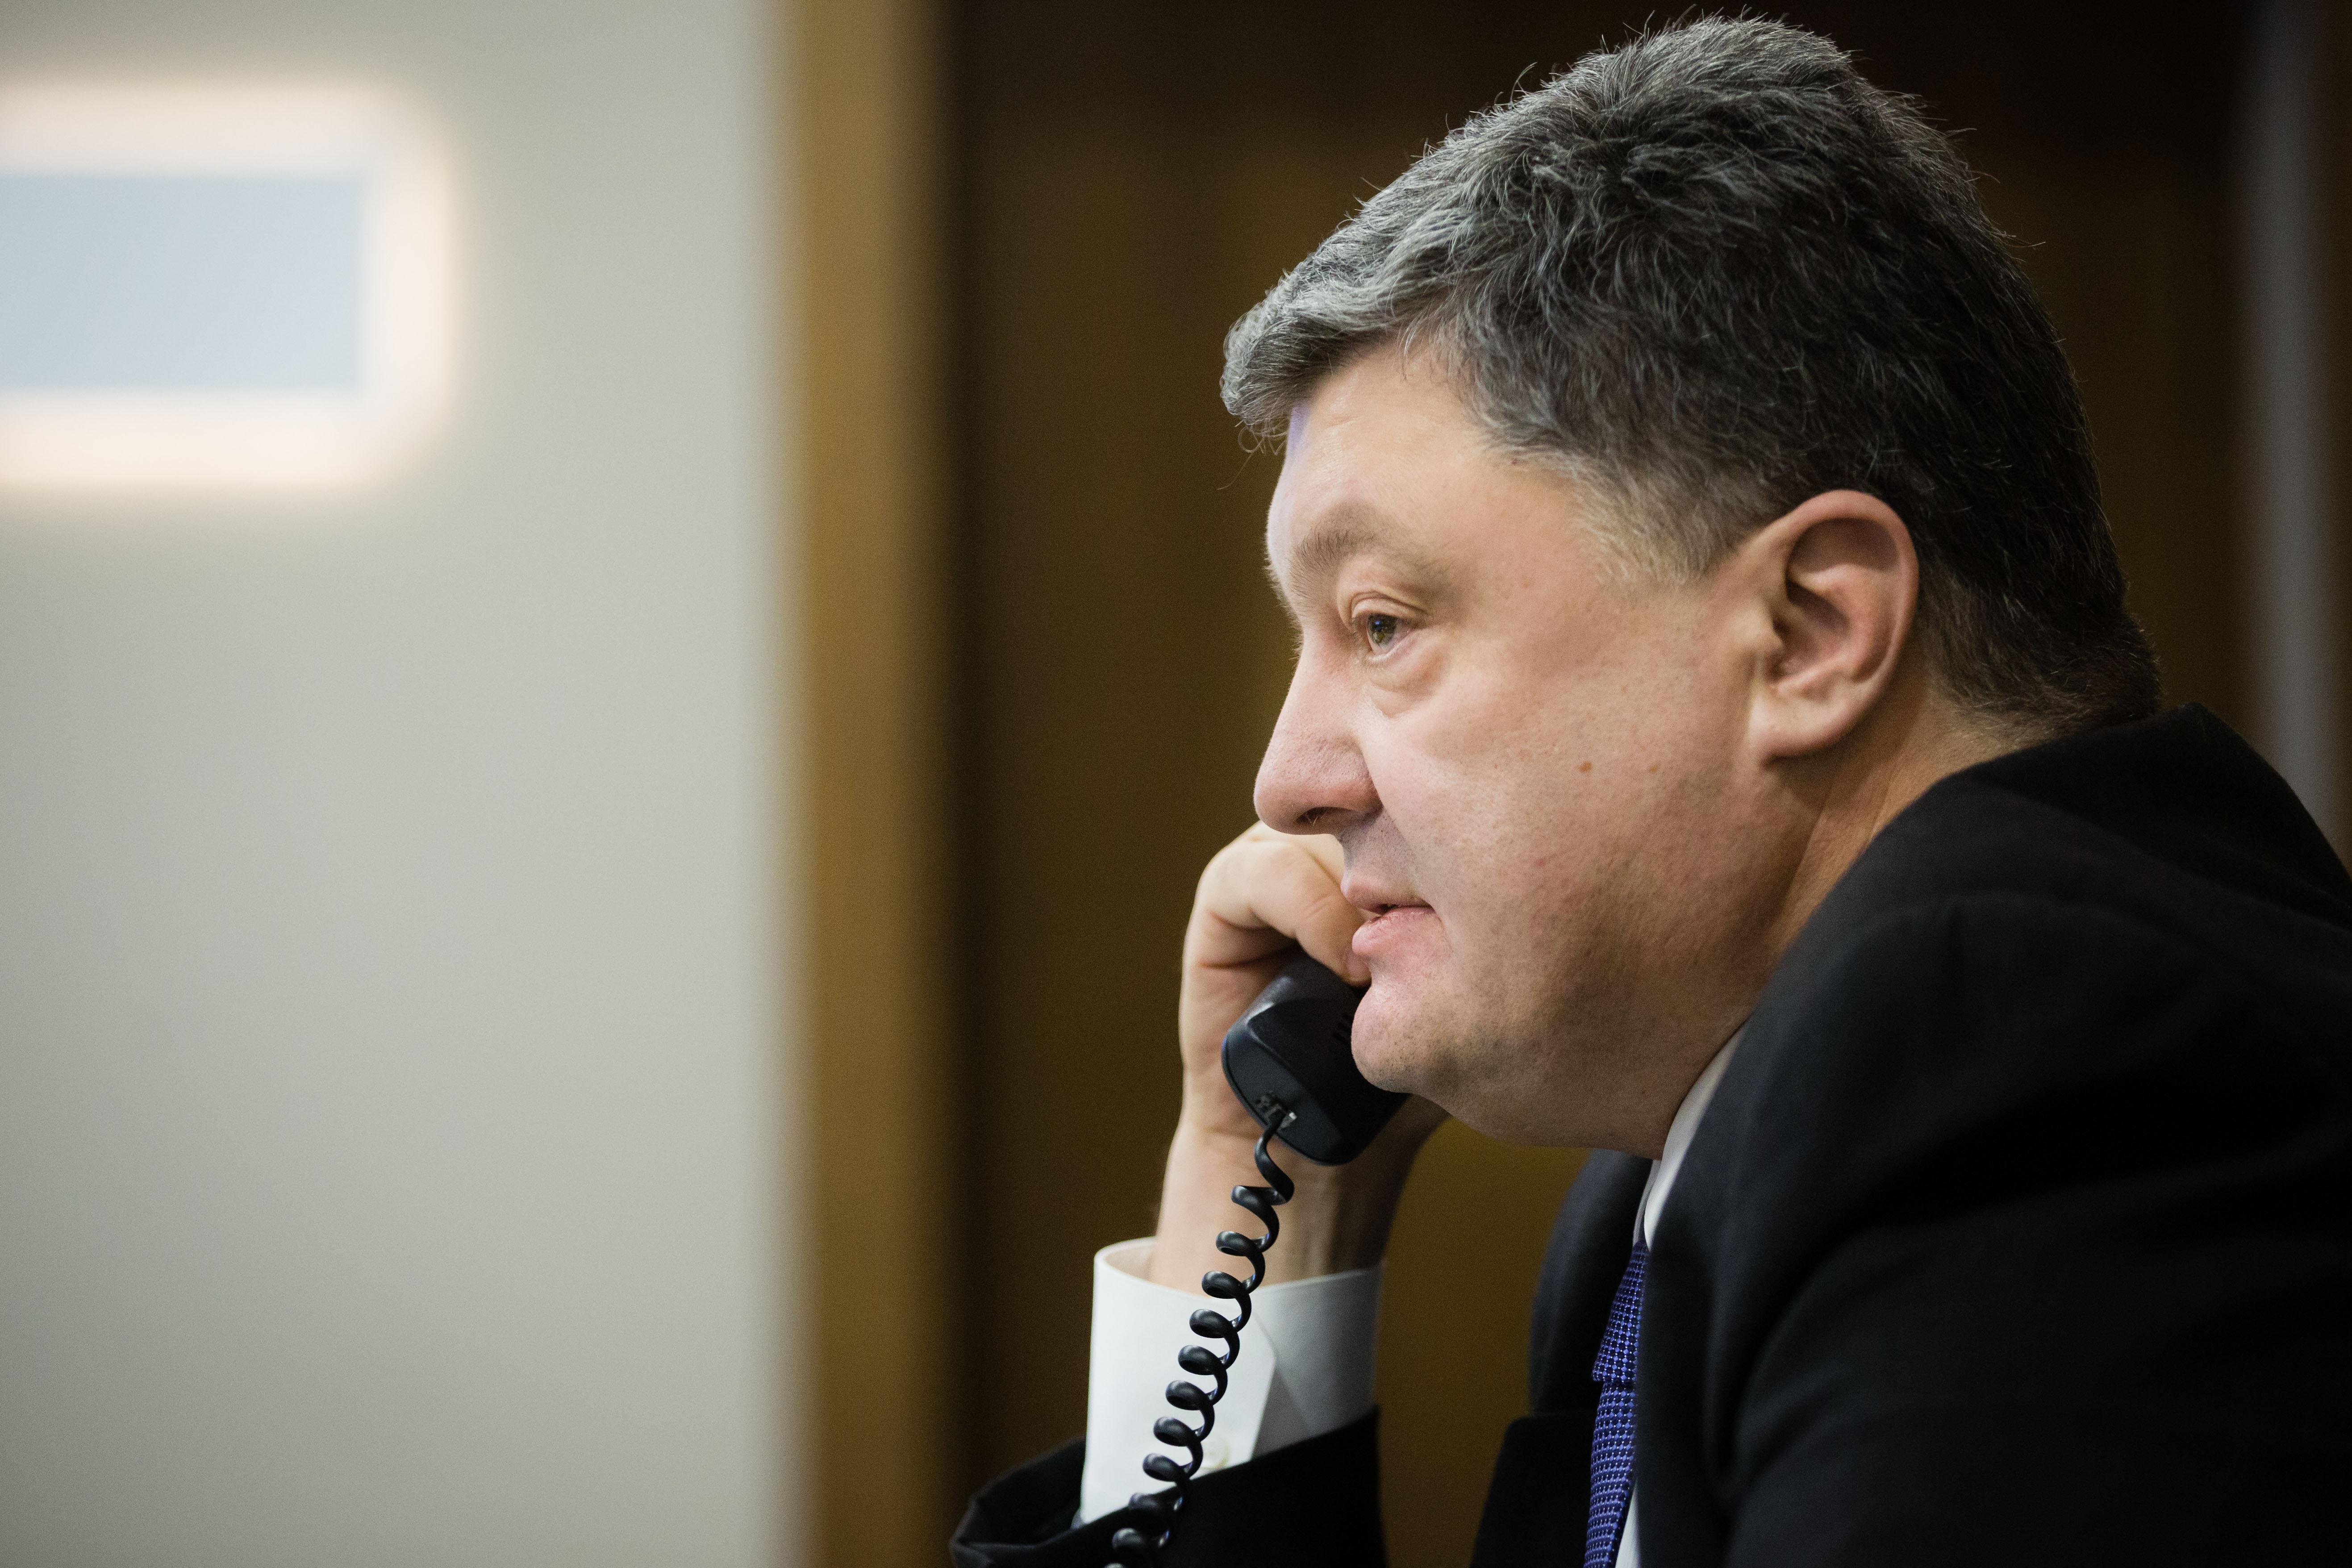 Петр Порошенко бросил трубку, написал пранкер